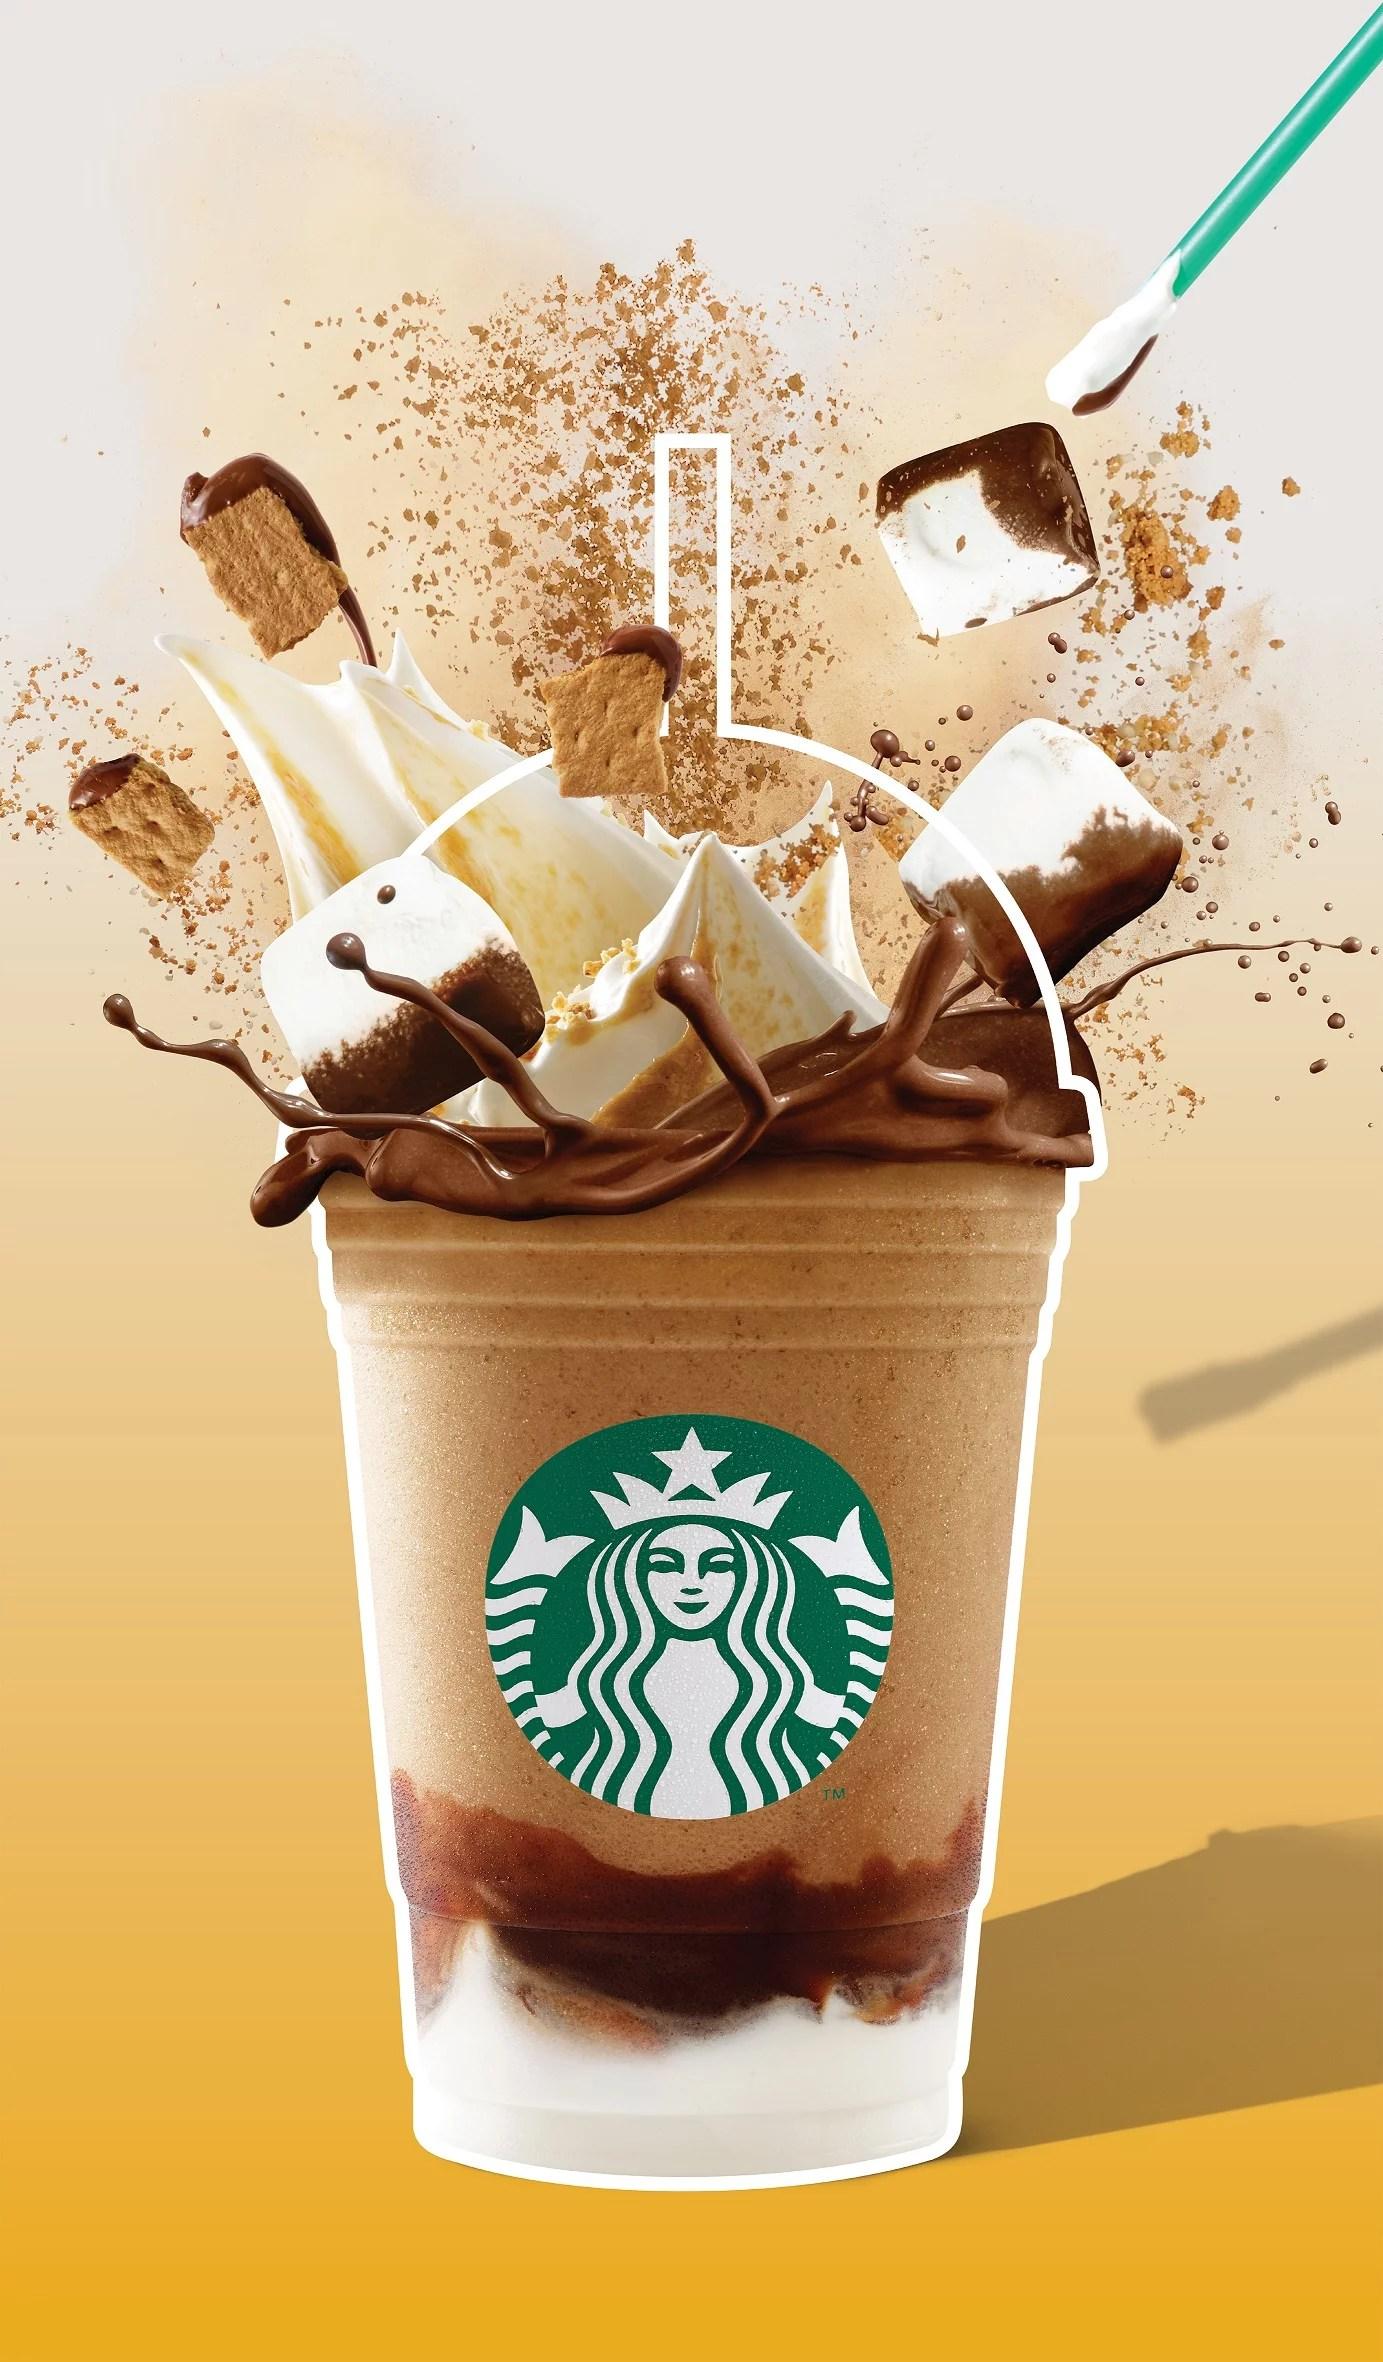 Starbucks Brings Back Smores Frappuccino